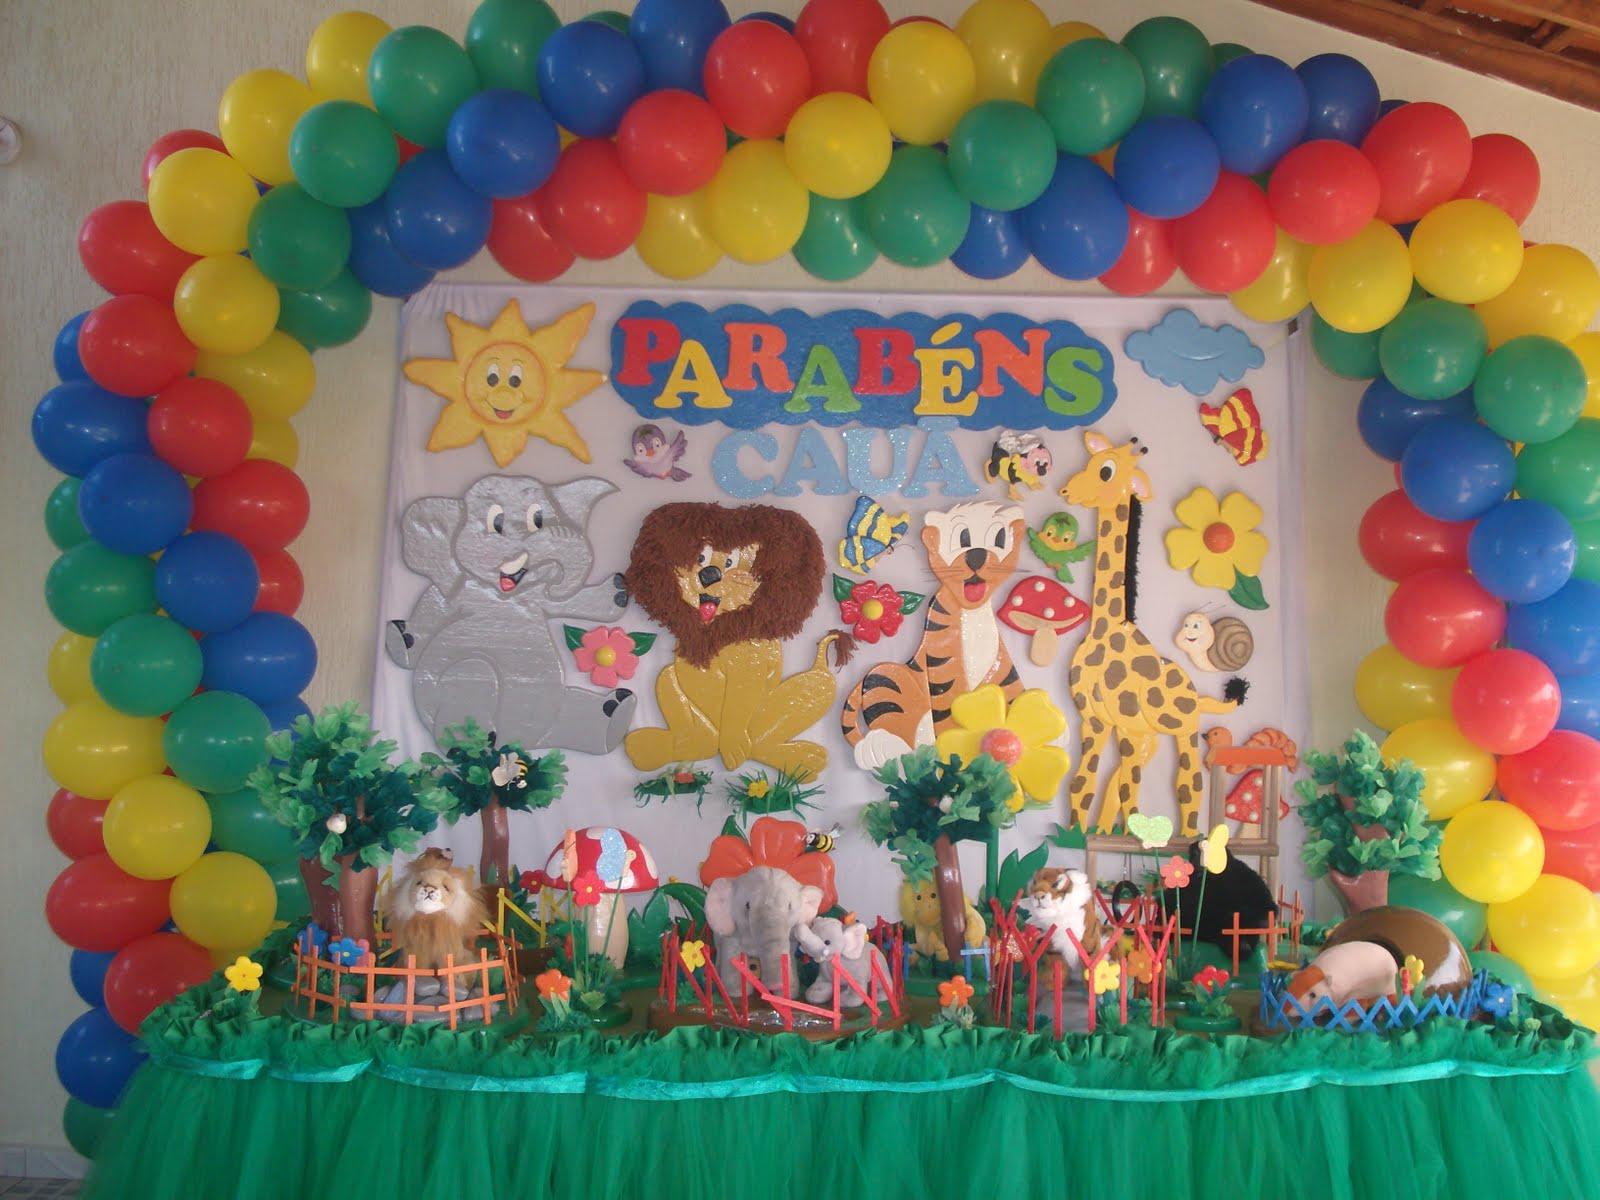 festa aniversario infantil jardim zoologico:Enviar por e-mail BlogThis! Compartilhar no Twitter Compartilhar no